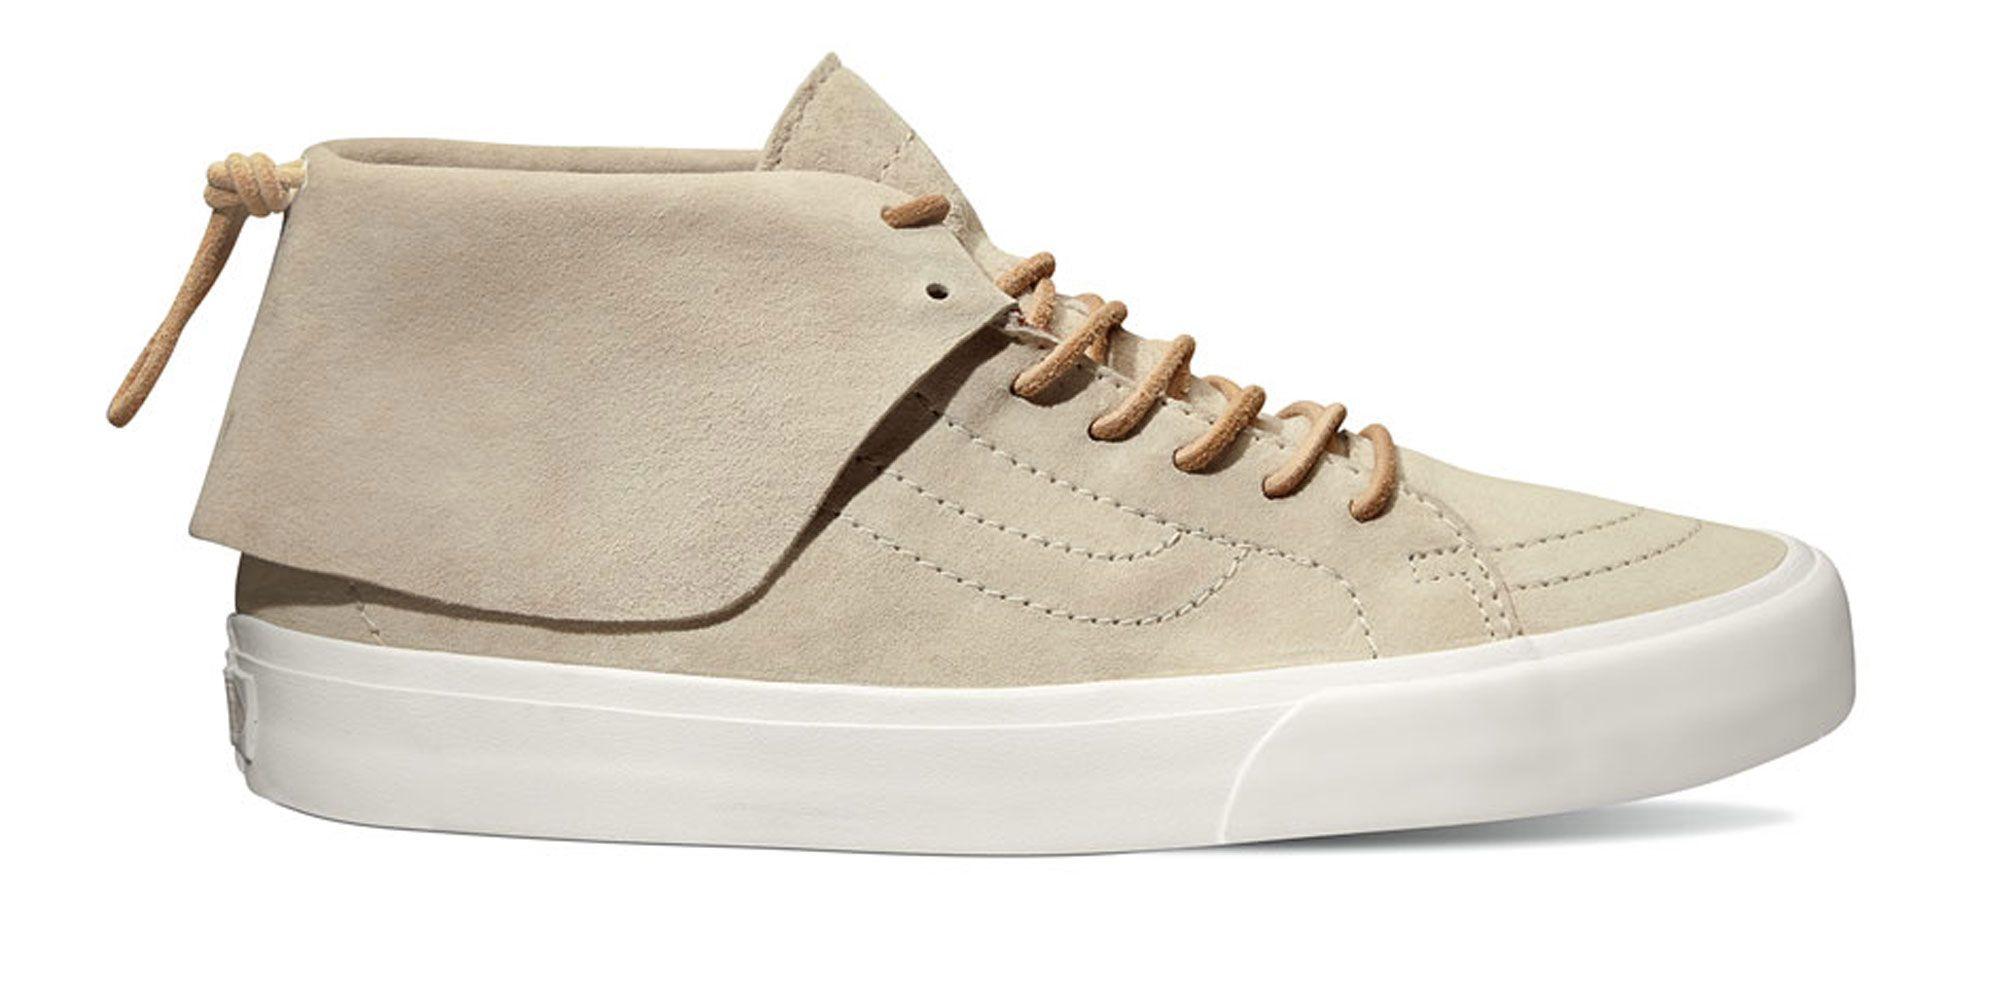 Feet First  Vans SK8-Mid Moc CA - SK8 Mid Moc California 2573652145